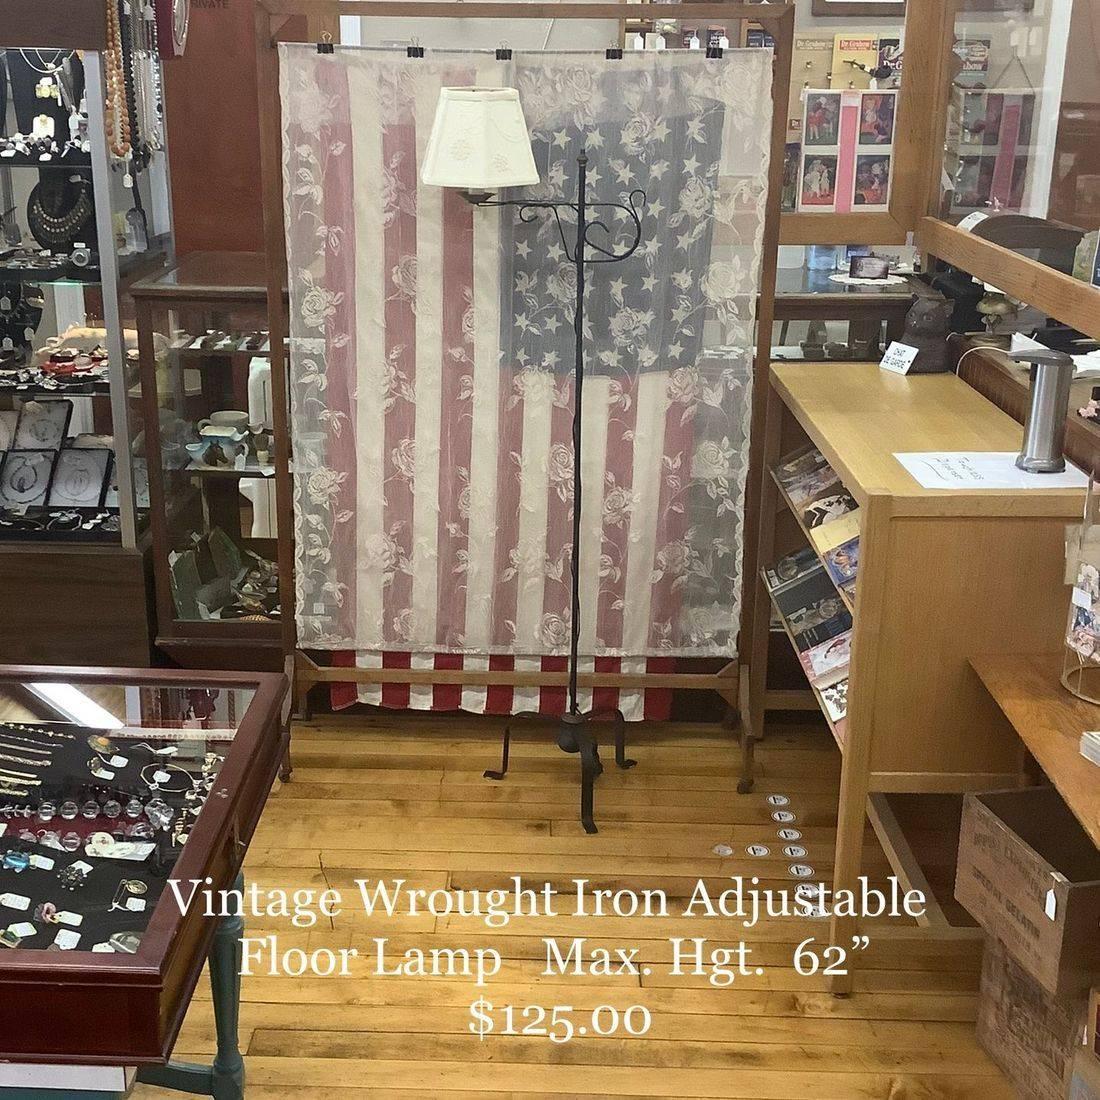 Vintage Wrought Iron Adjustable Floor Lamp   $125.00